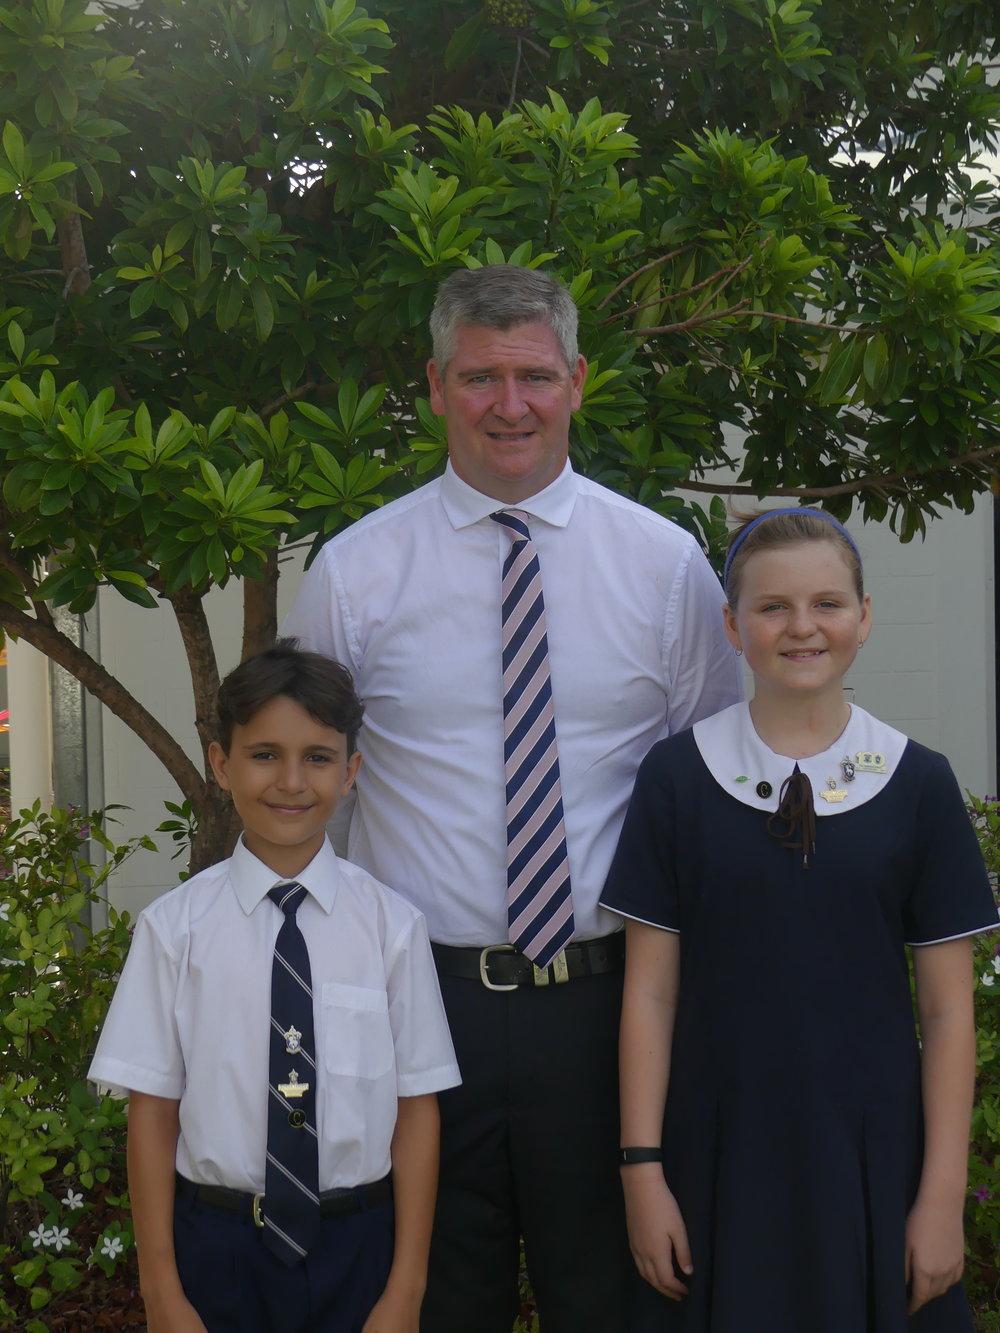 Head of Junior School - Mr Luke Baills